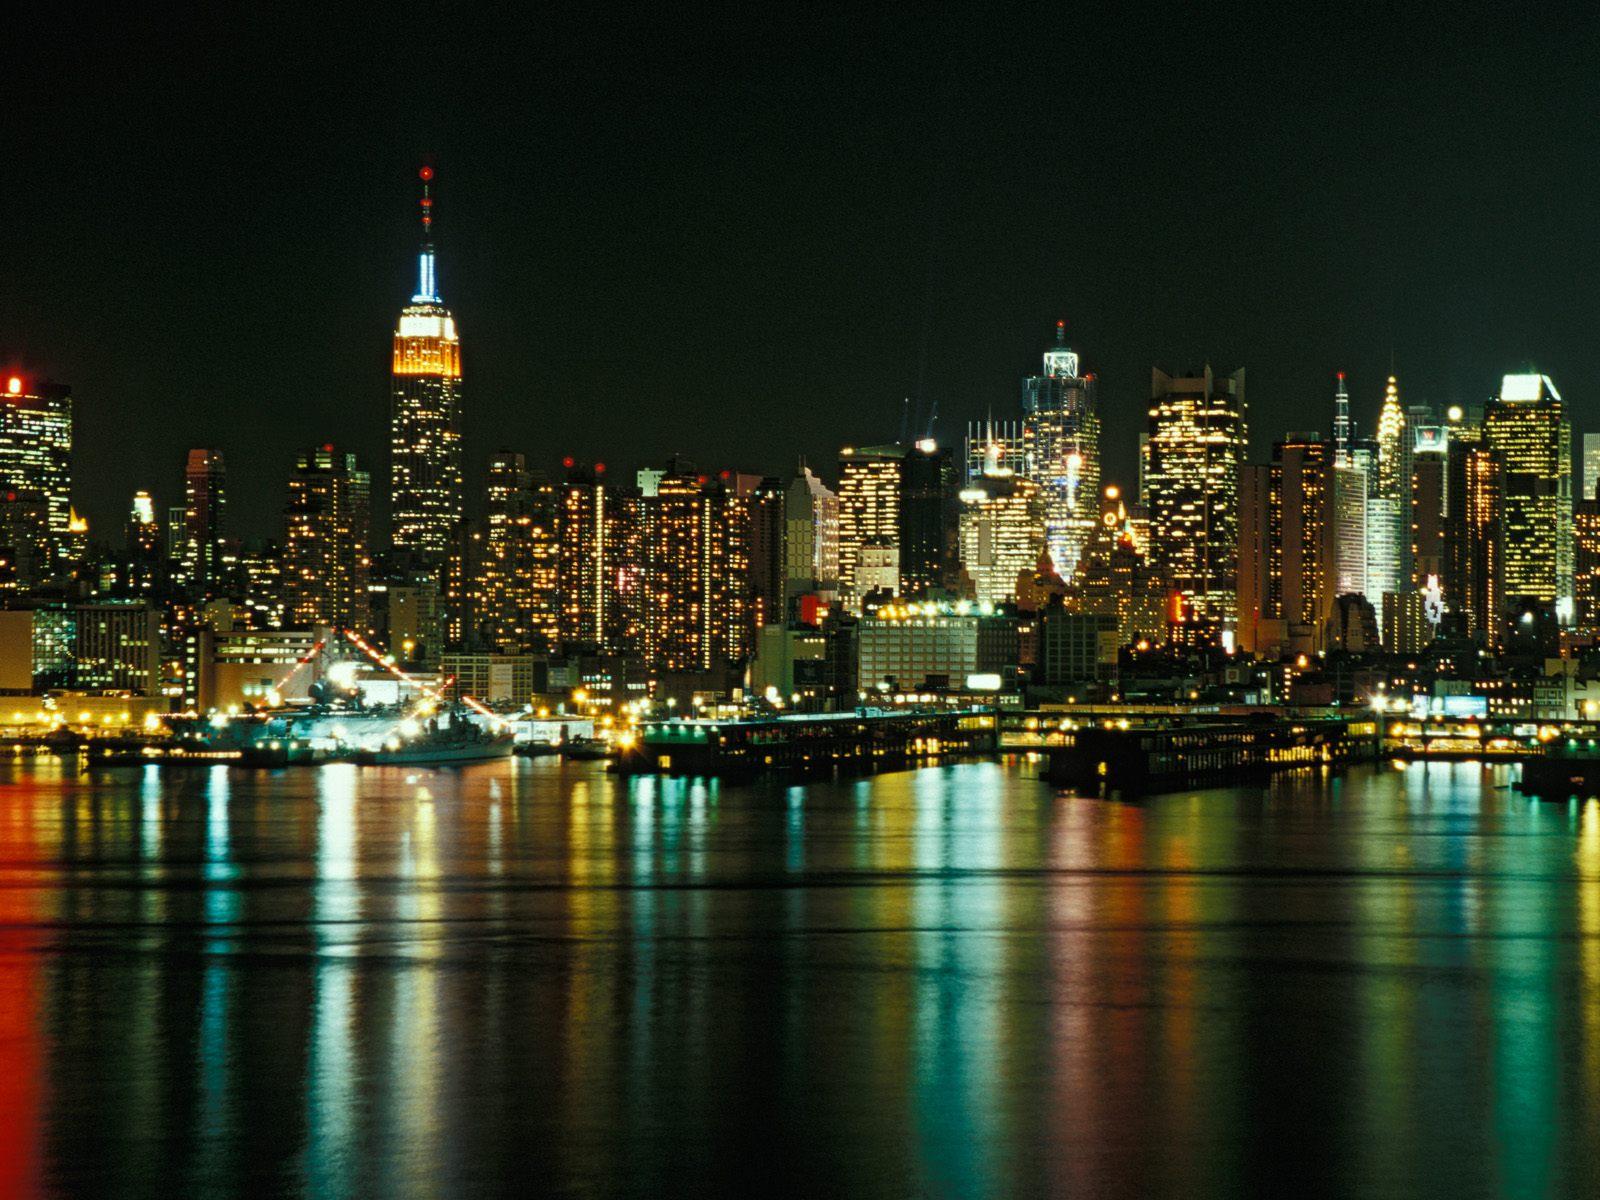 ... wallpaper, 'new york city skyline as seen from weehawken new jersey